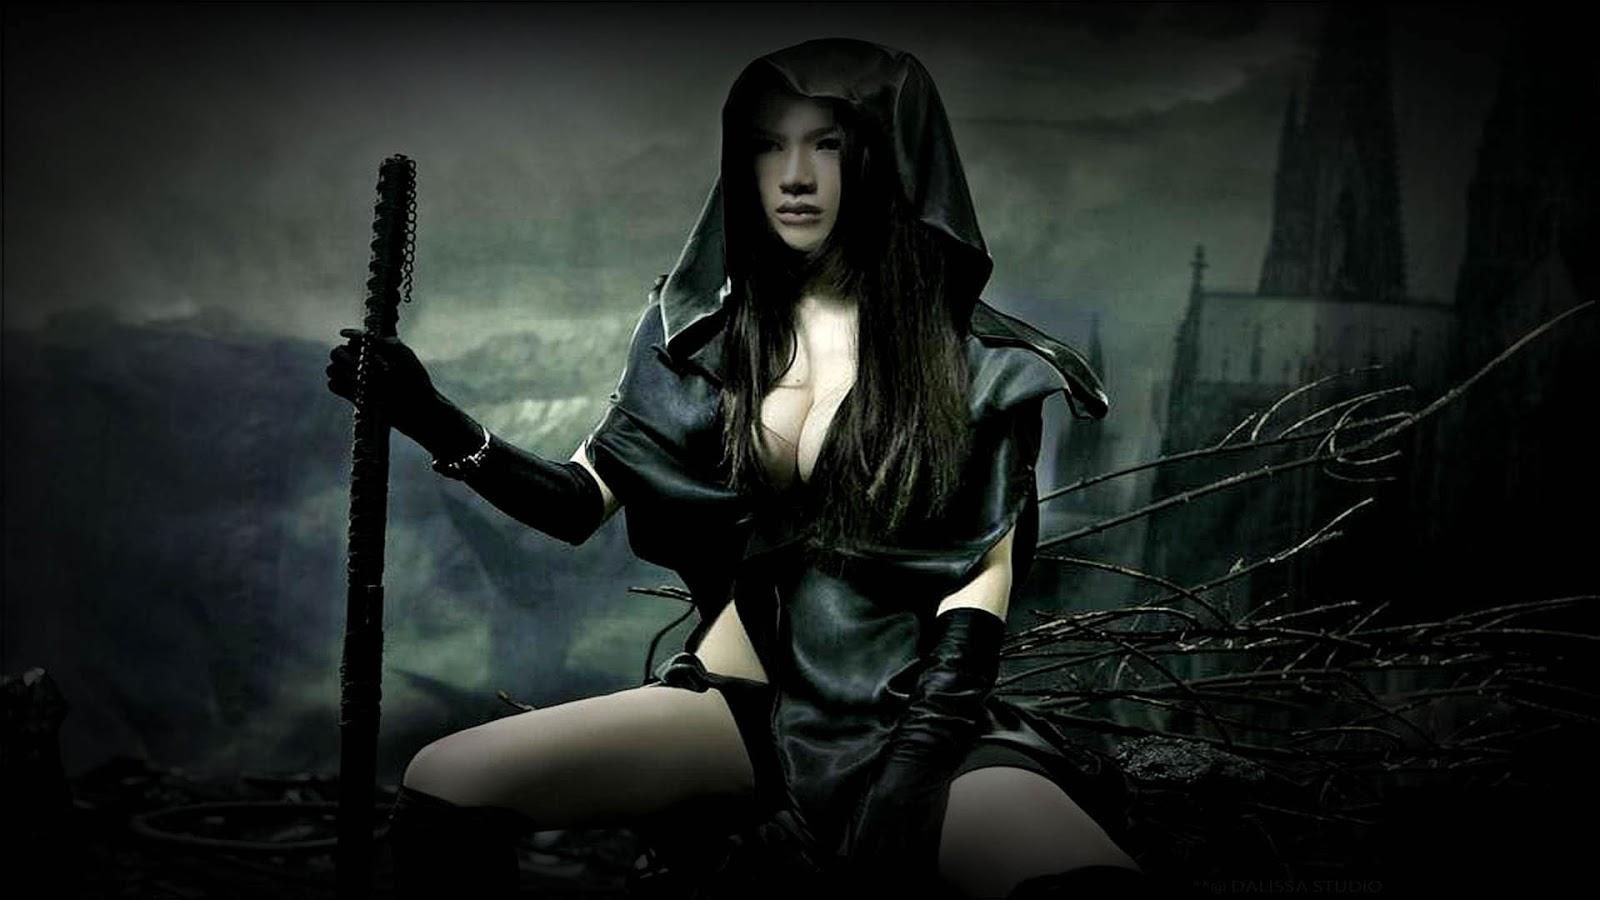 download wallpaper female warrior - photo #18